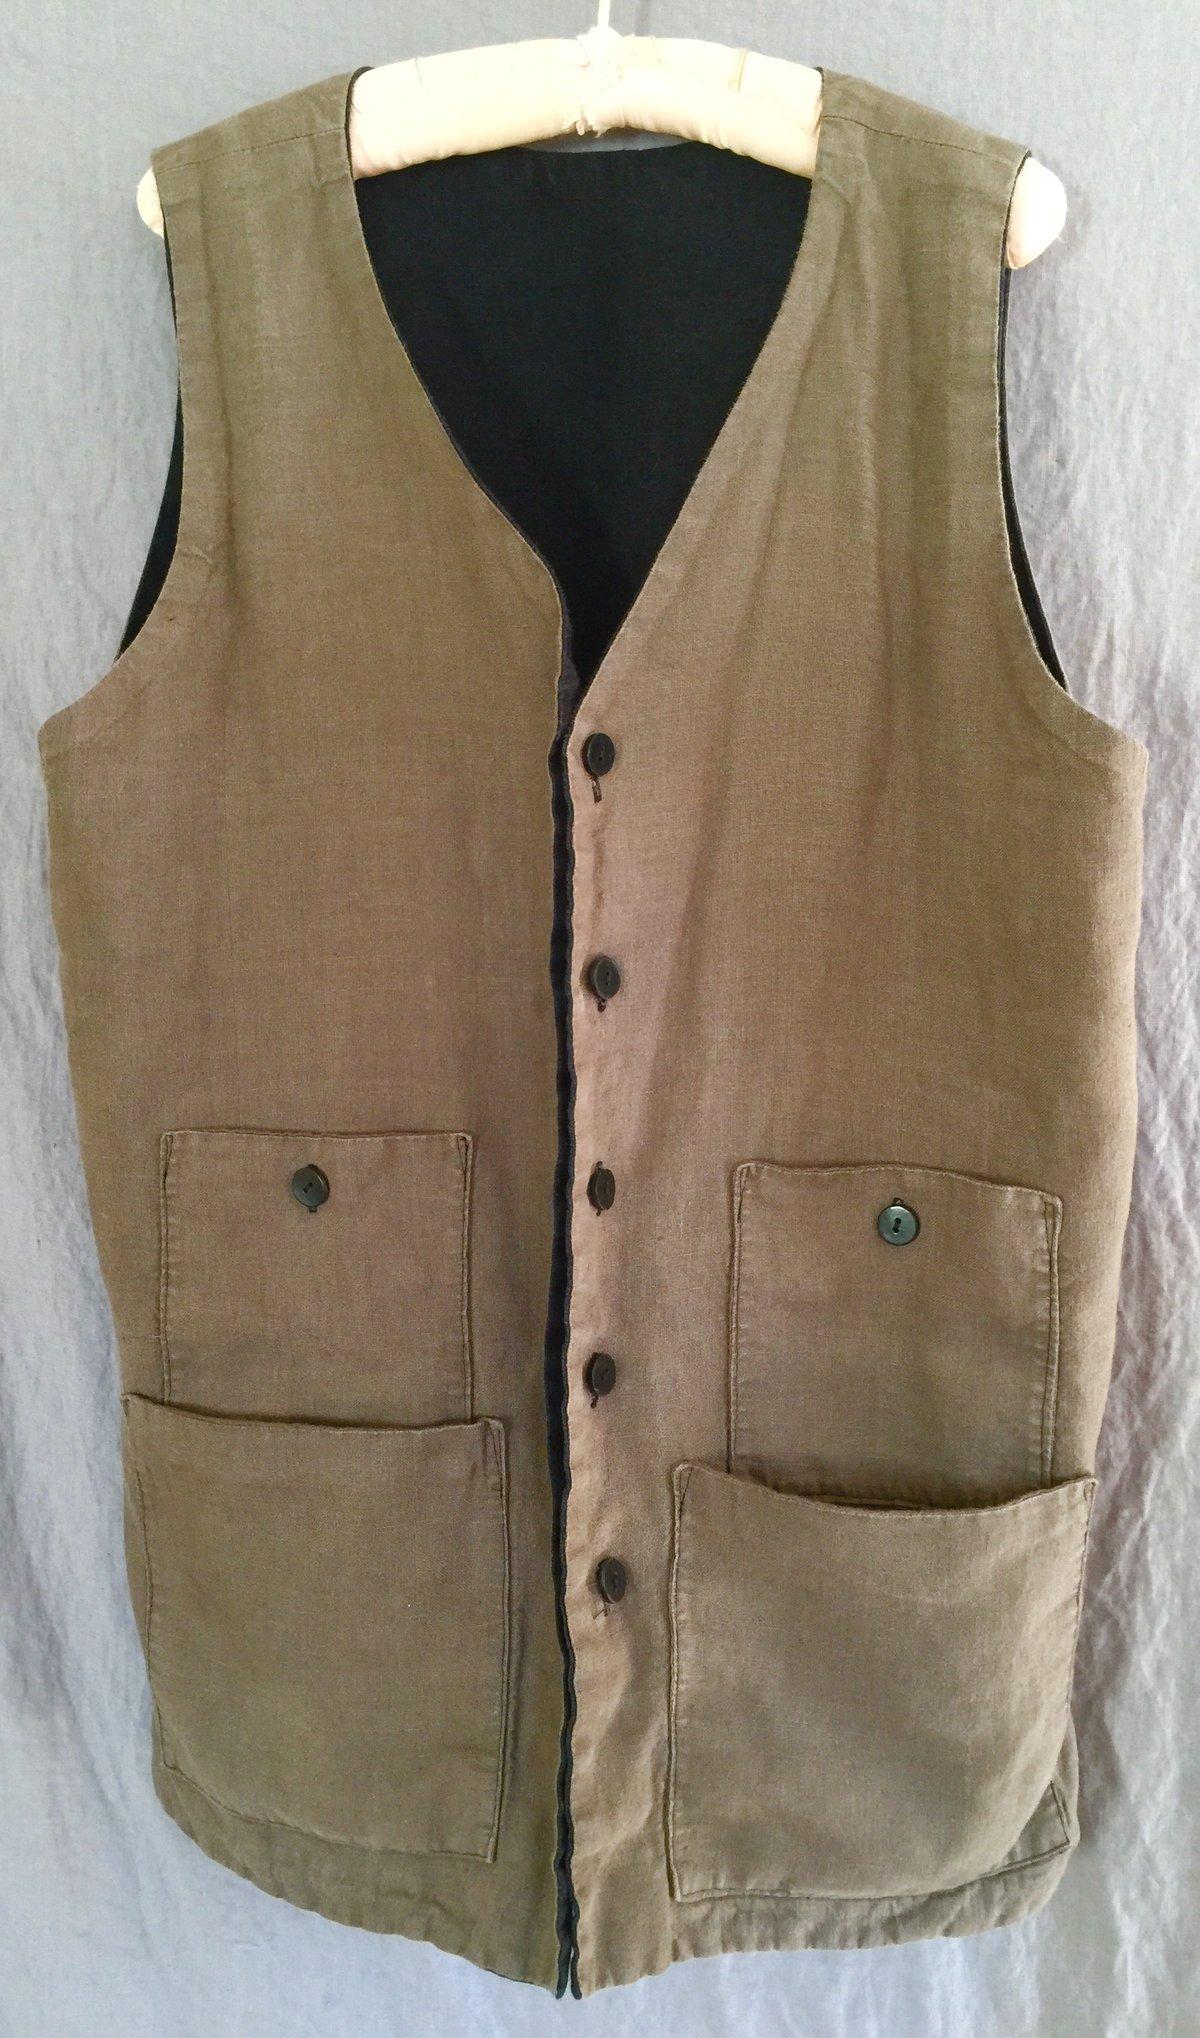 Image of reversable pocket vest